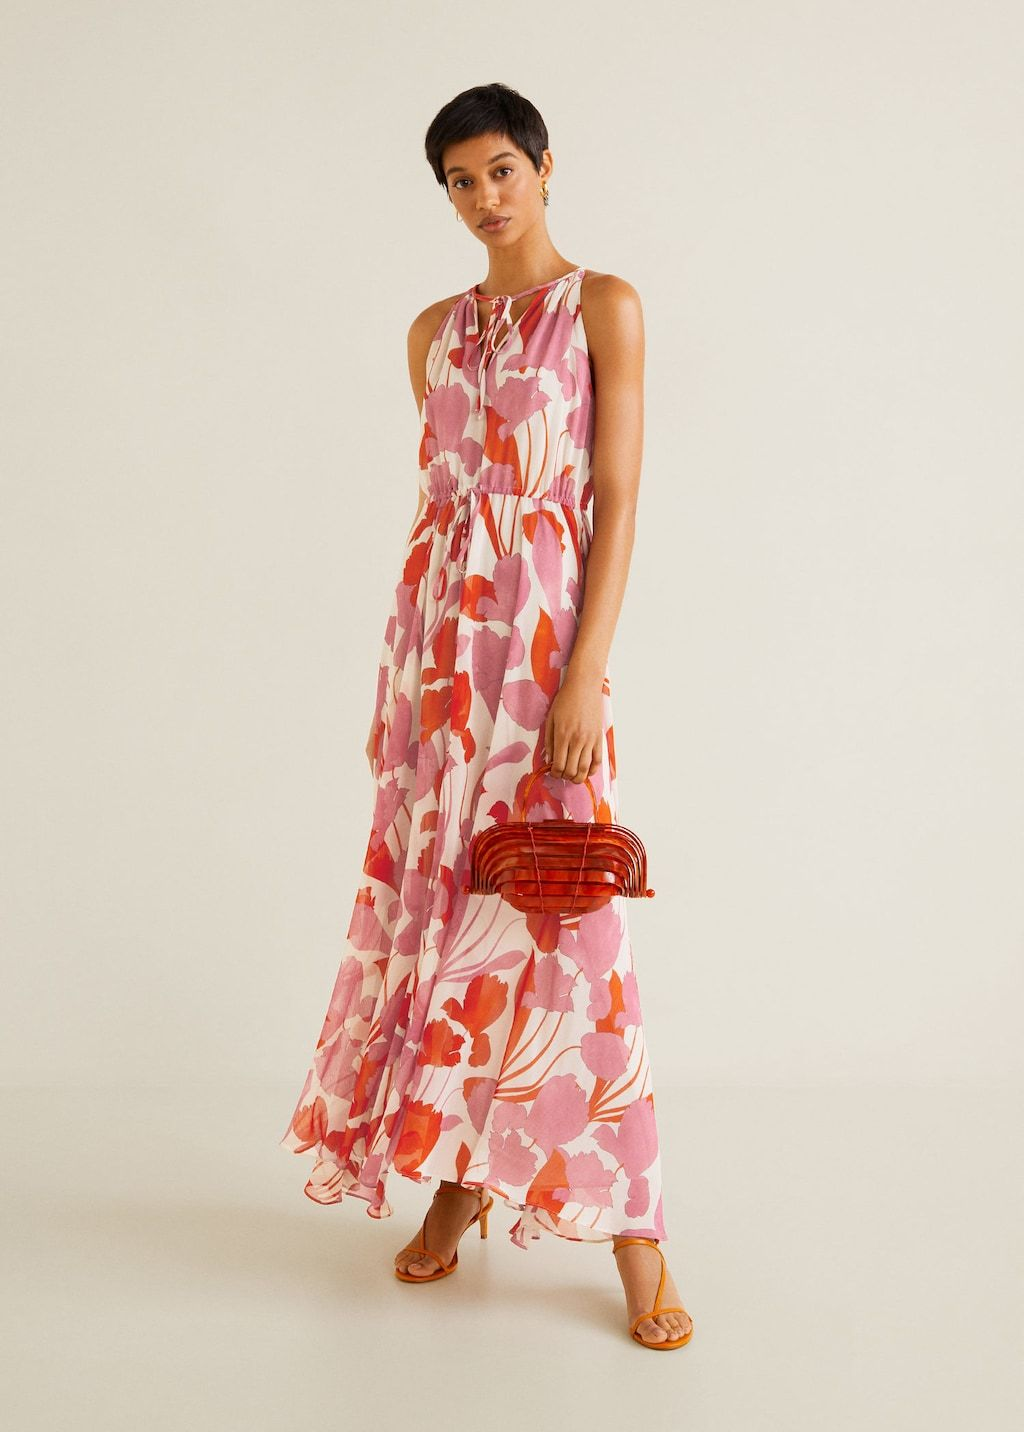 Mango Printed Long Dresses Mango Clothing Dresses